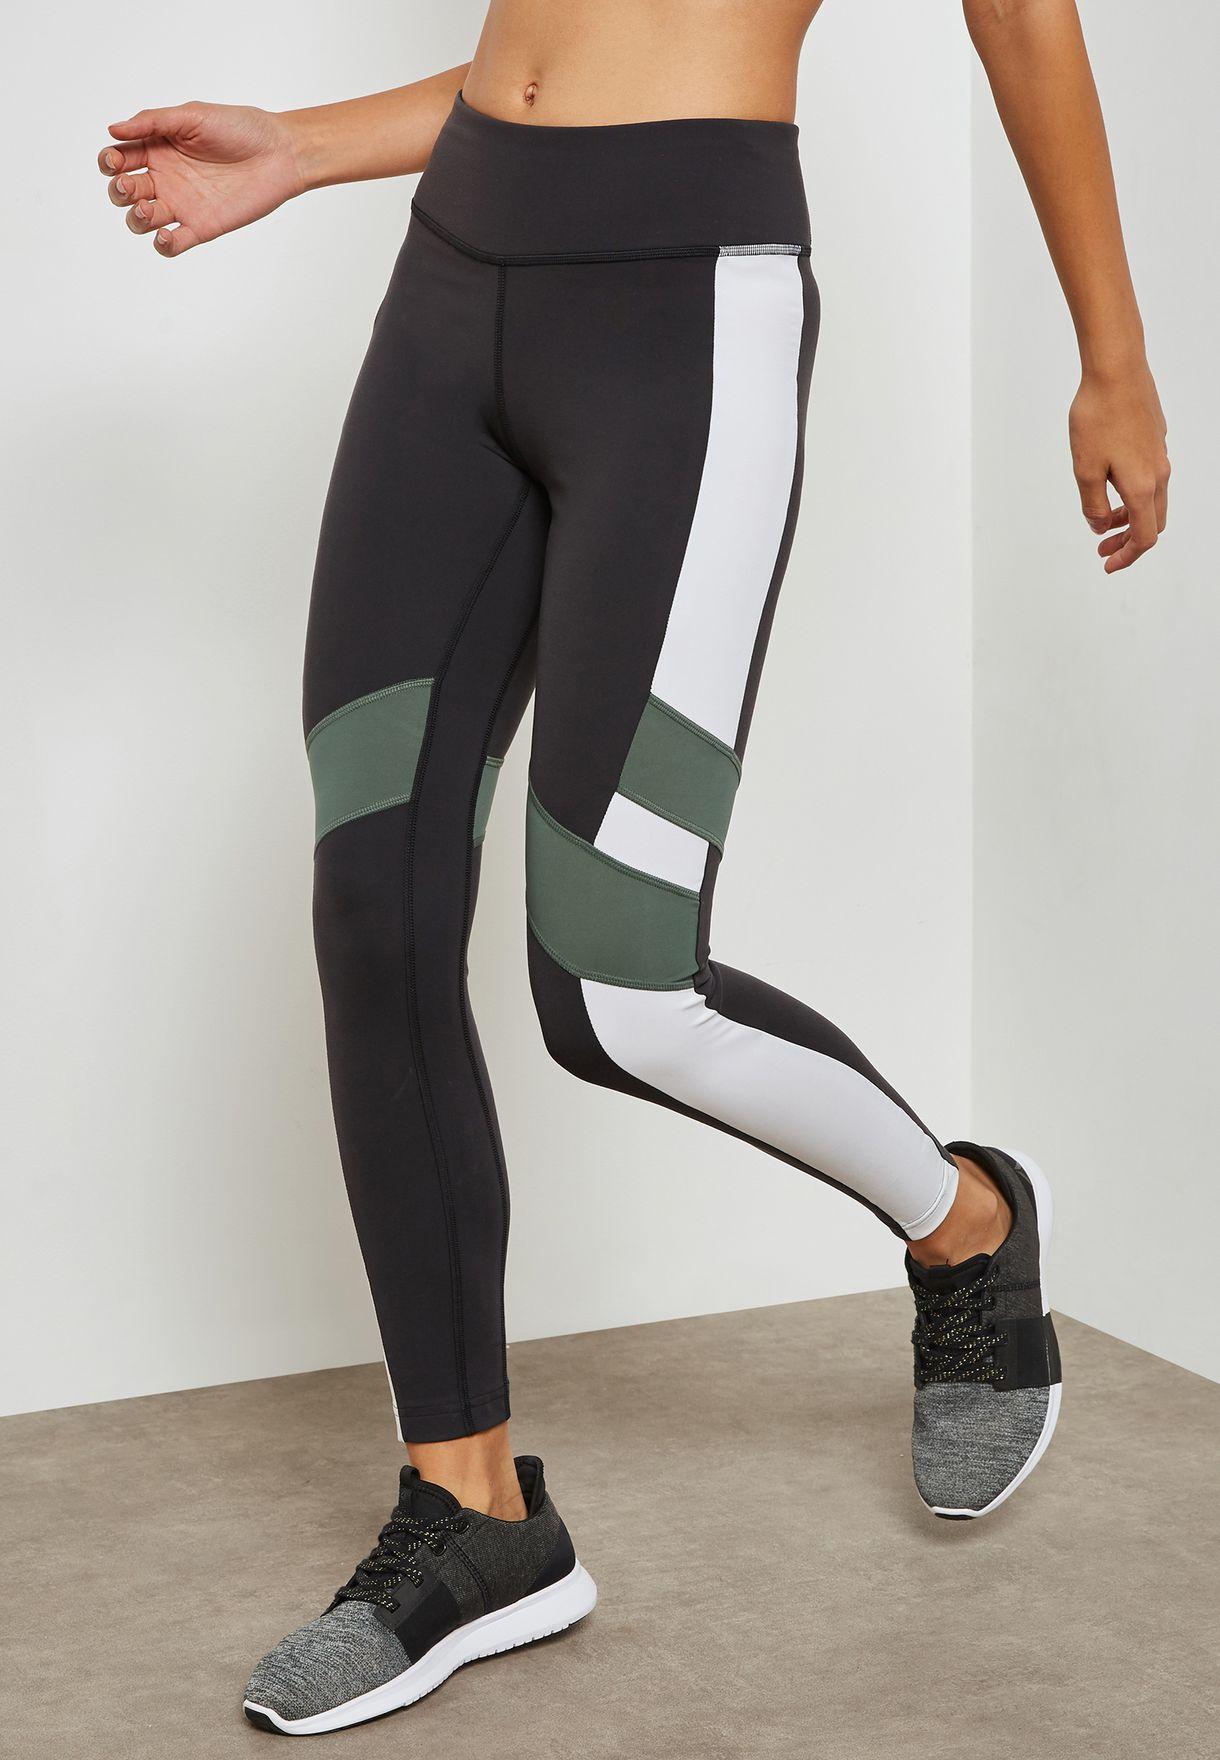 293109e866a05 Shop Reebok multicolor Lux Colour Block Leggings D94129 for Women in ...